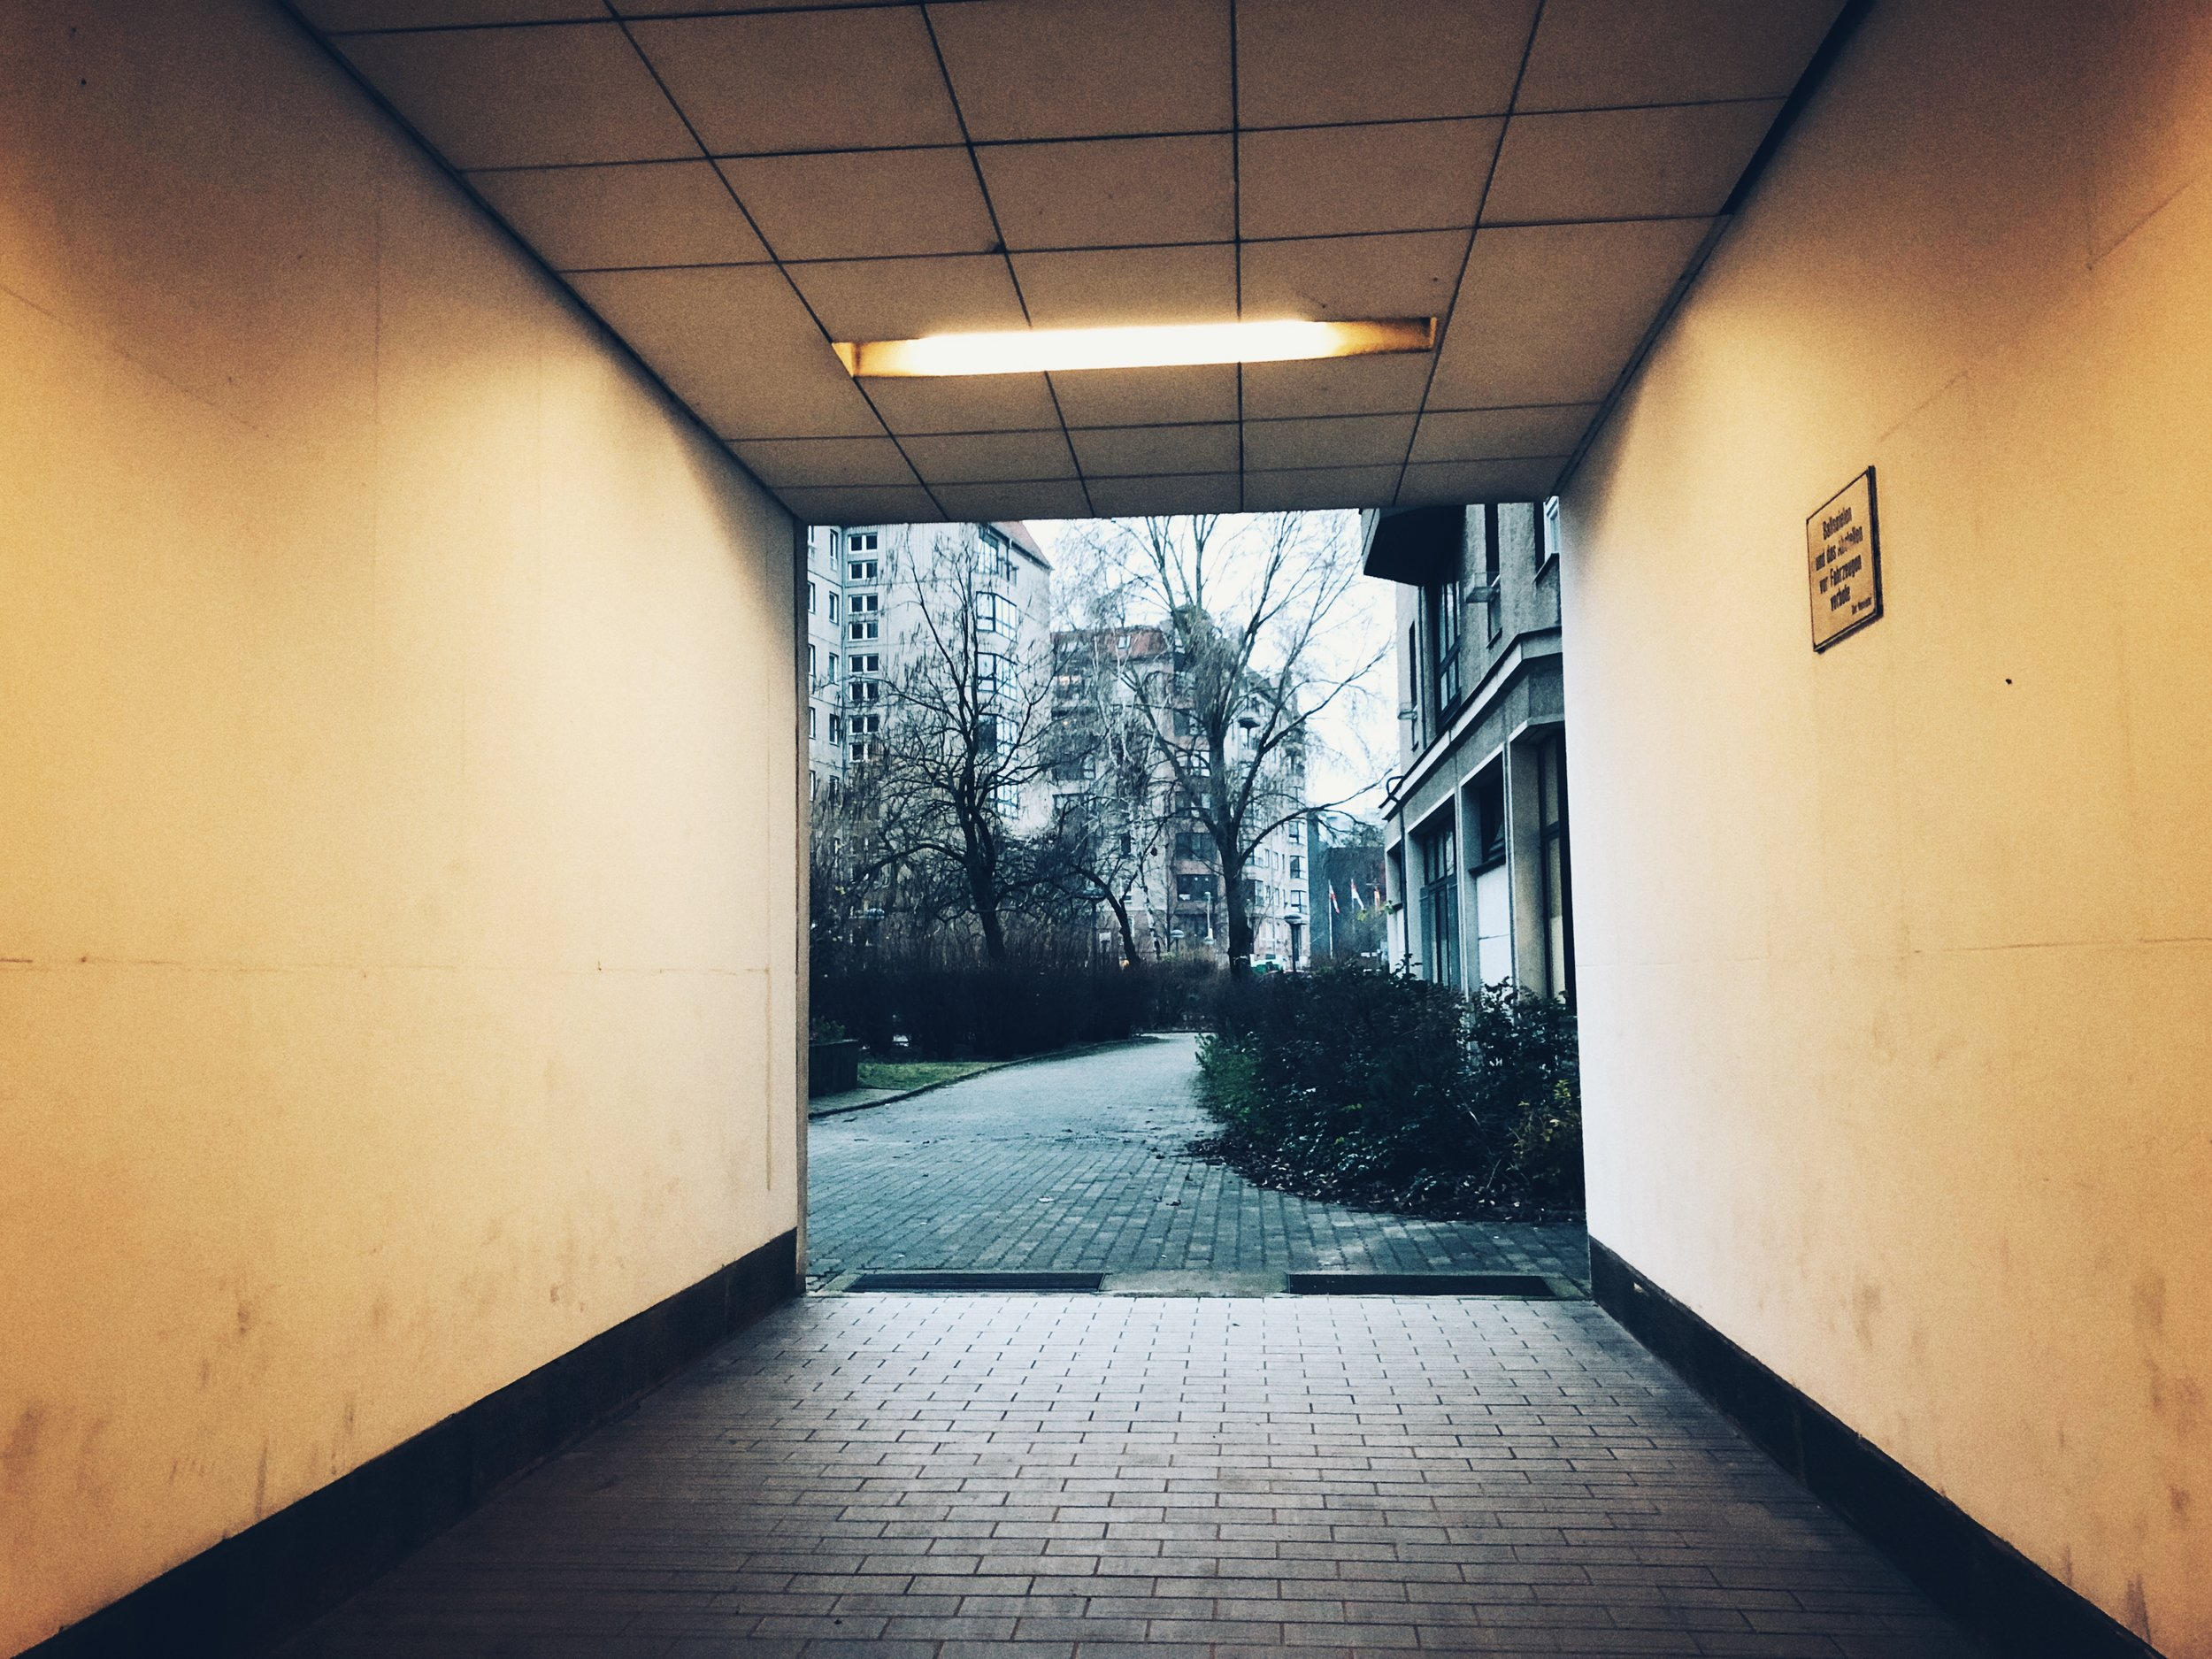 entrance to former site of hitler's bunker